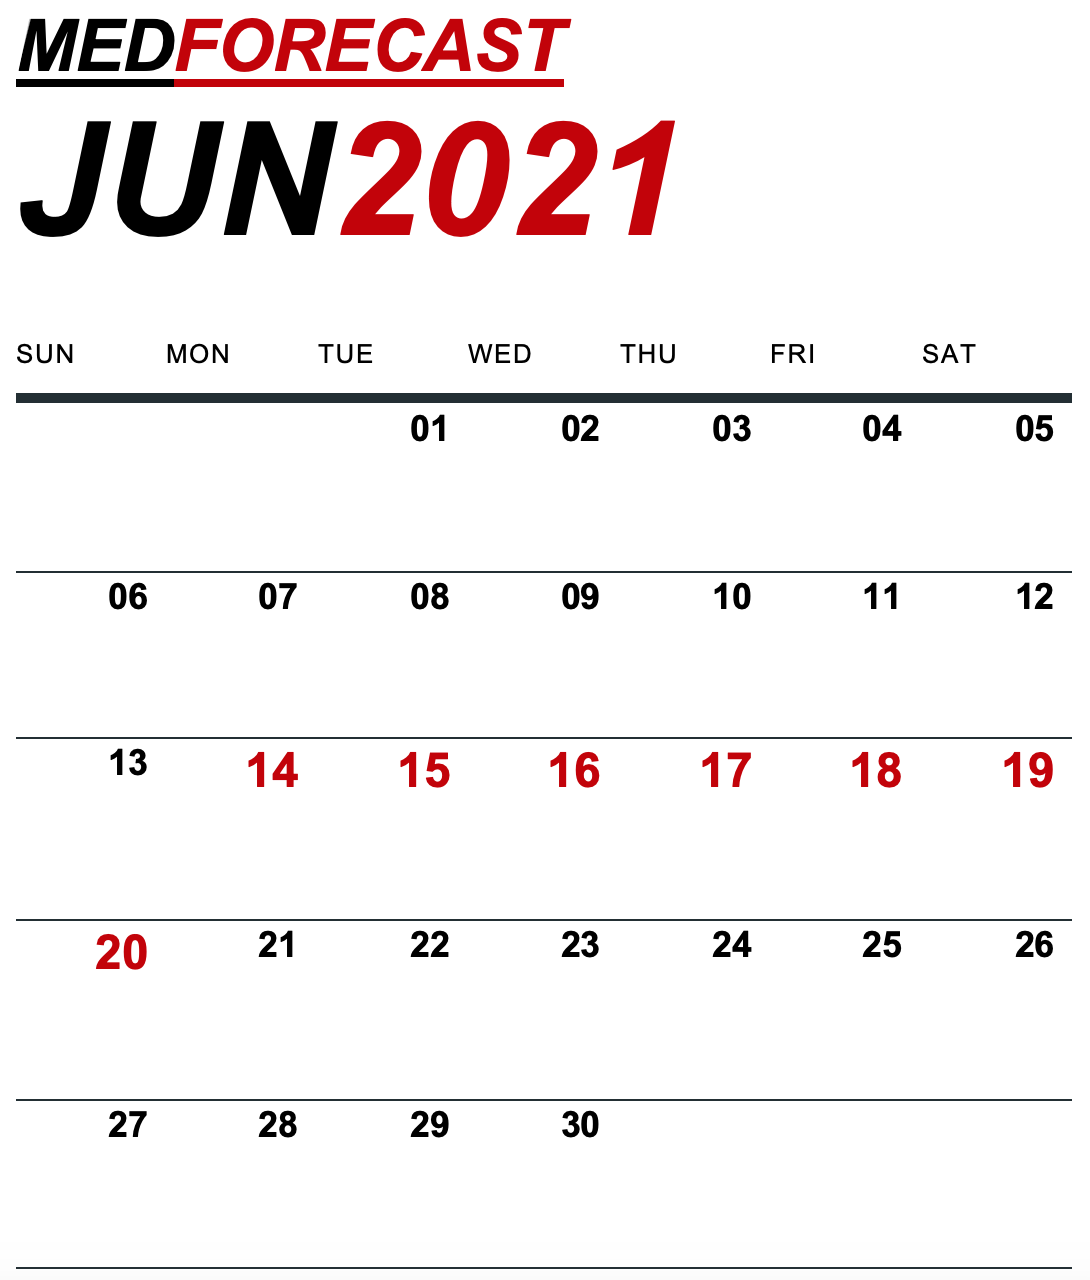 Medical News Forecast for June 14-20